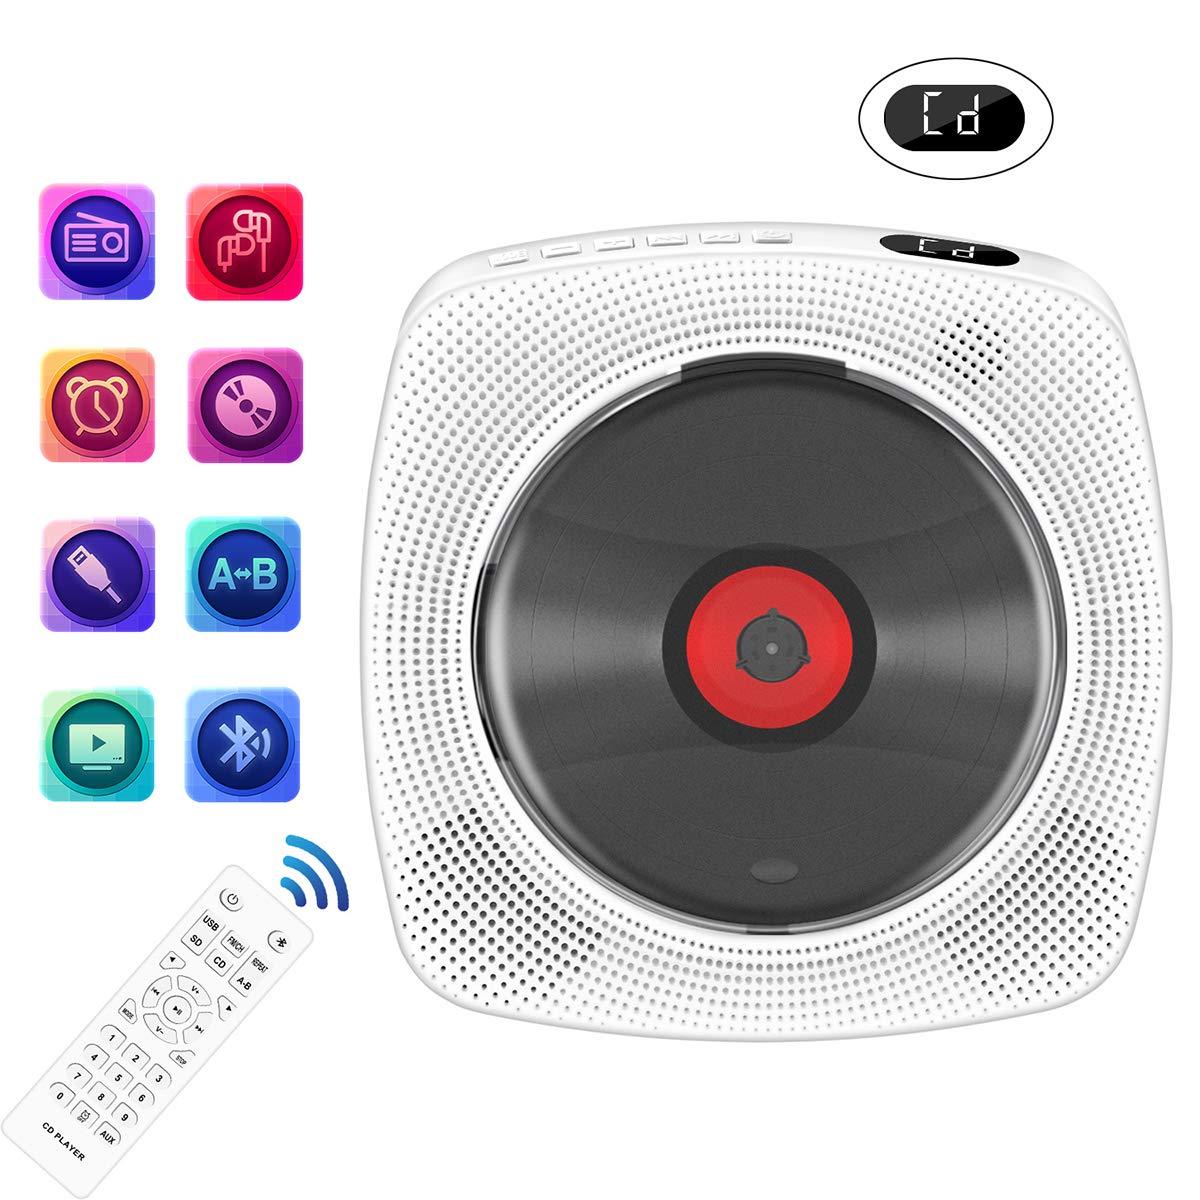 Portable Bluetooth Mountable Headphone Inteli Topia